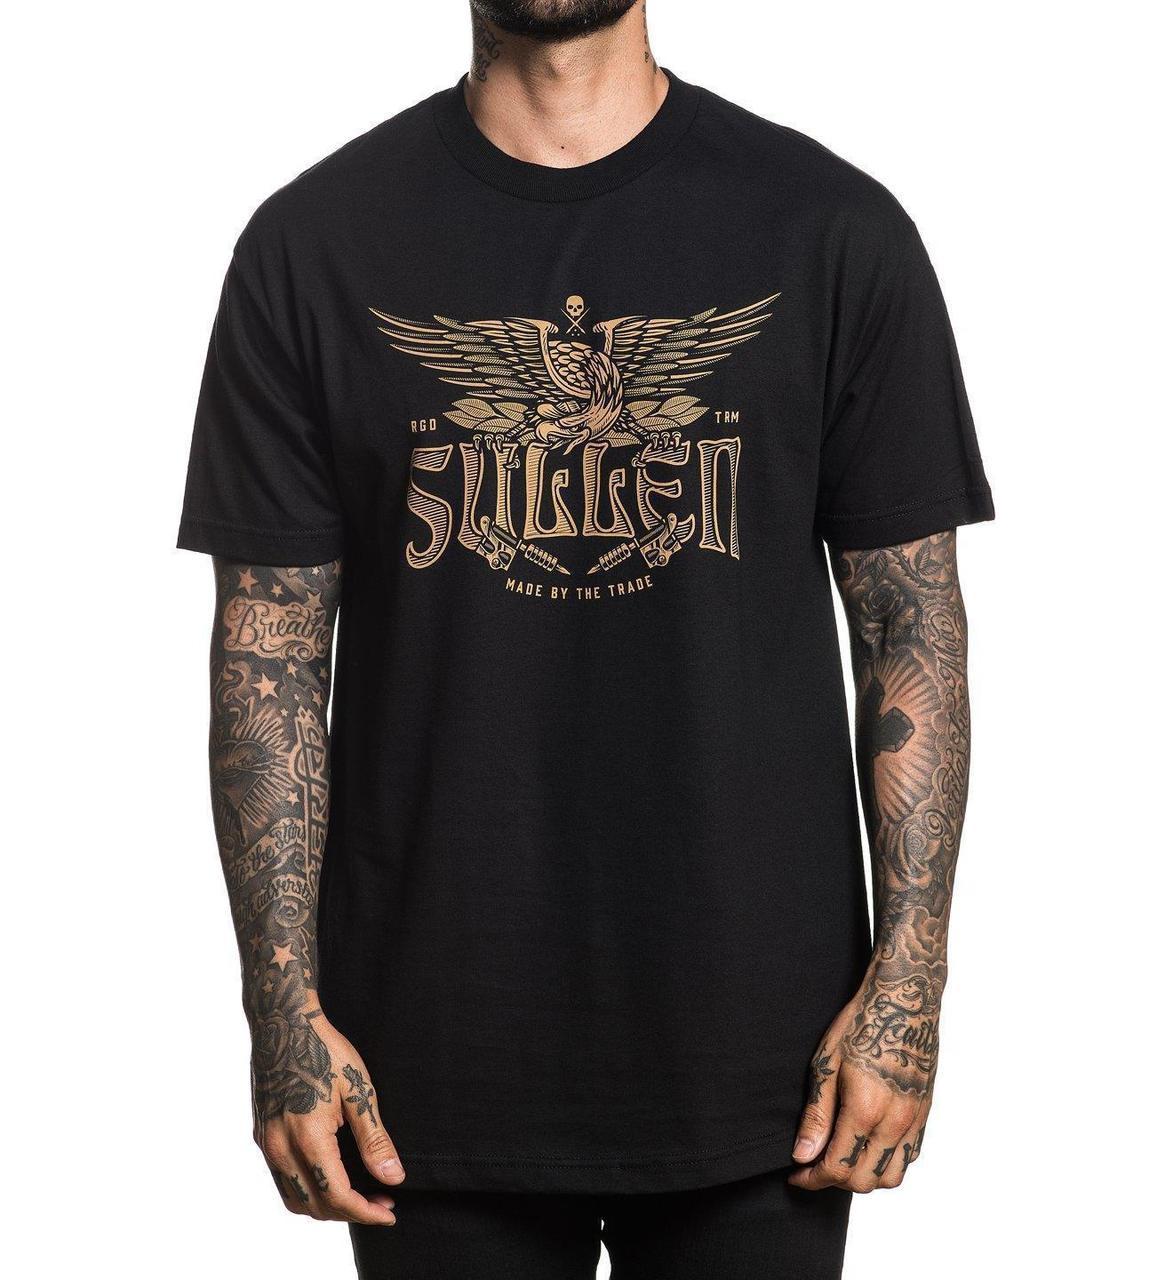 a534cd1011e7 Sullen Art Collective Traditional Tattoos Gun Eagle Urban Inked T Shirt  SCM1967